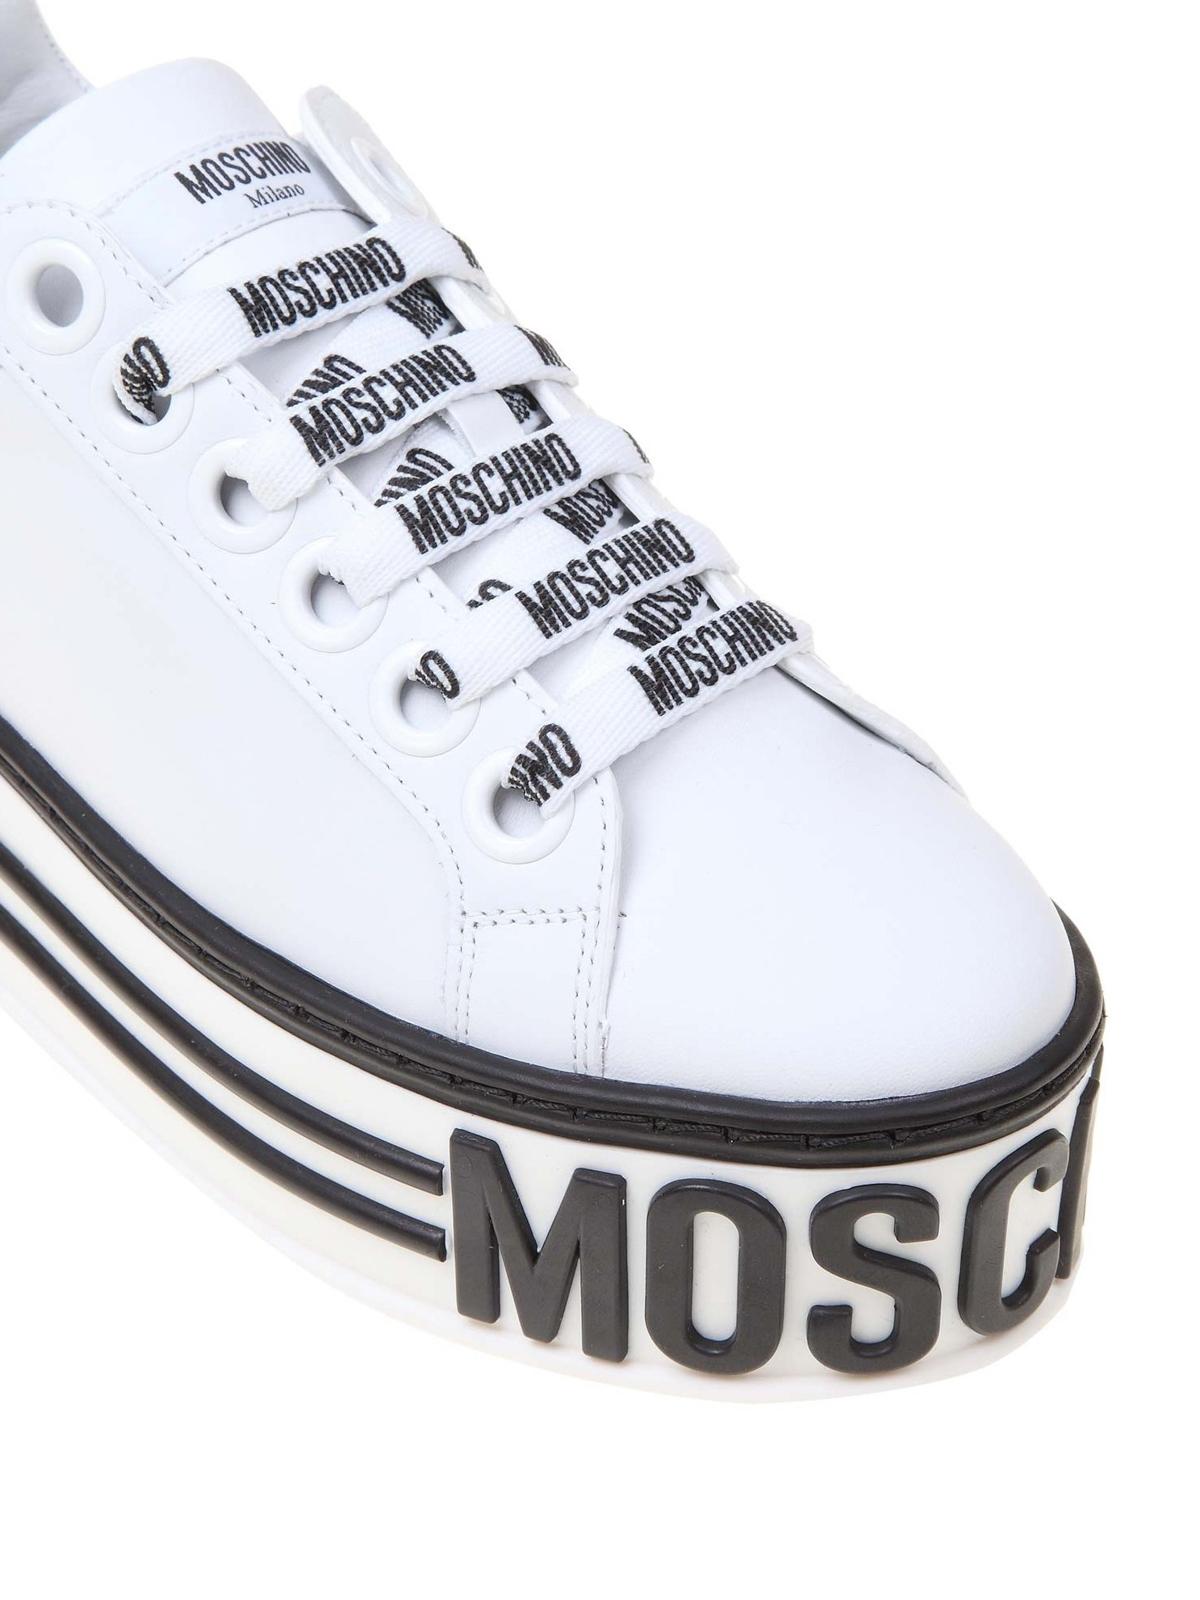 Moschino - Platform sneakers - trainers